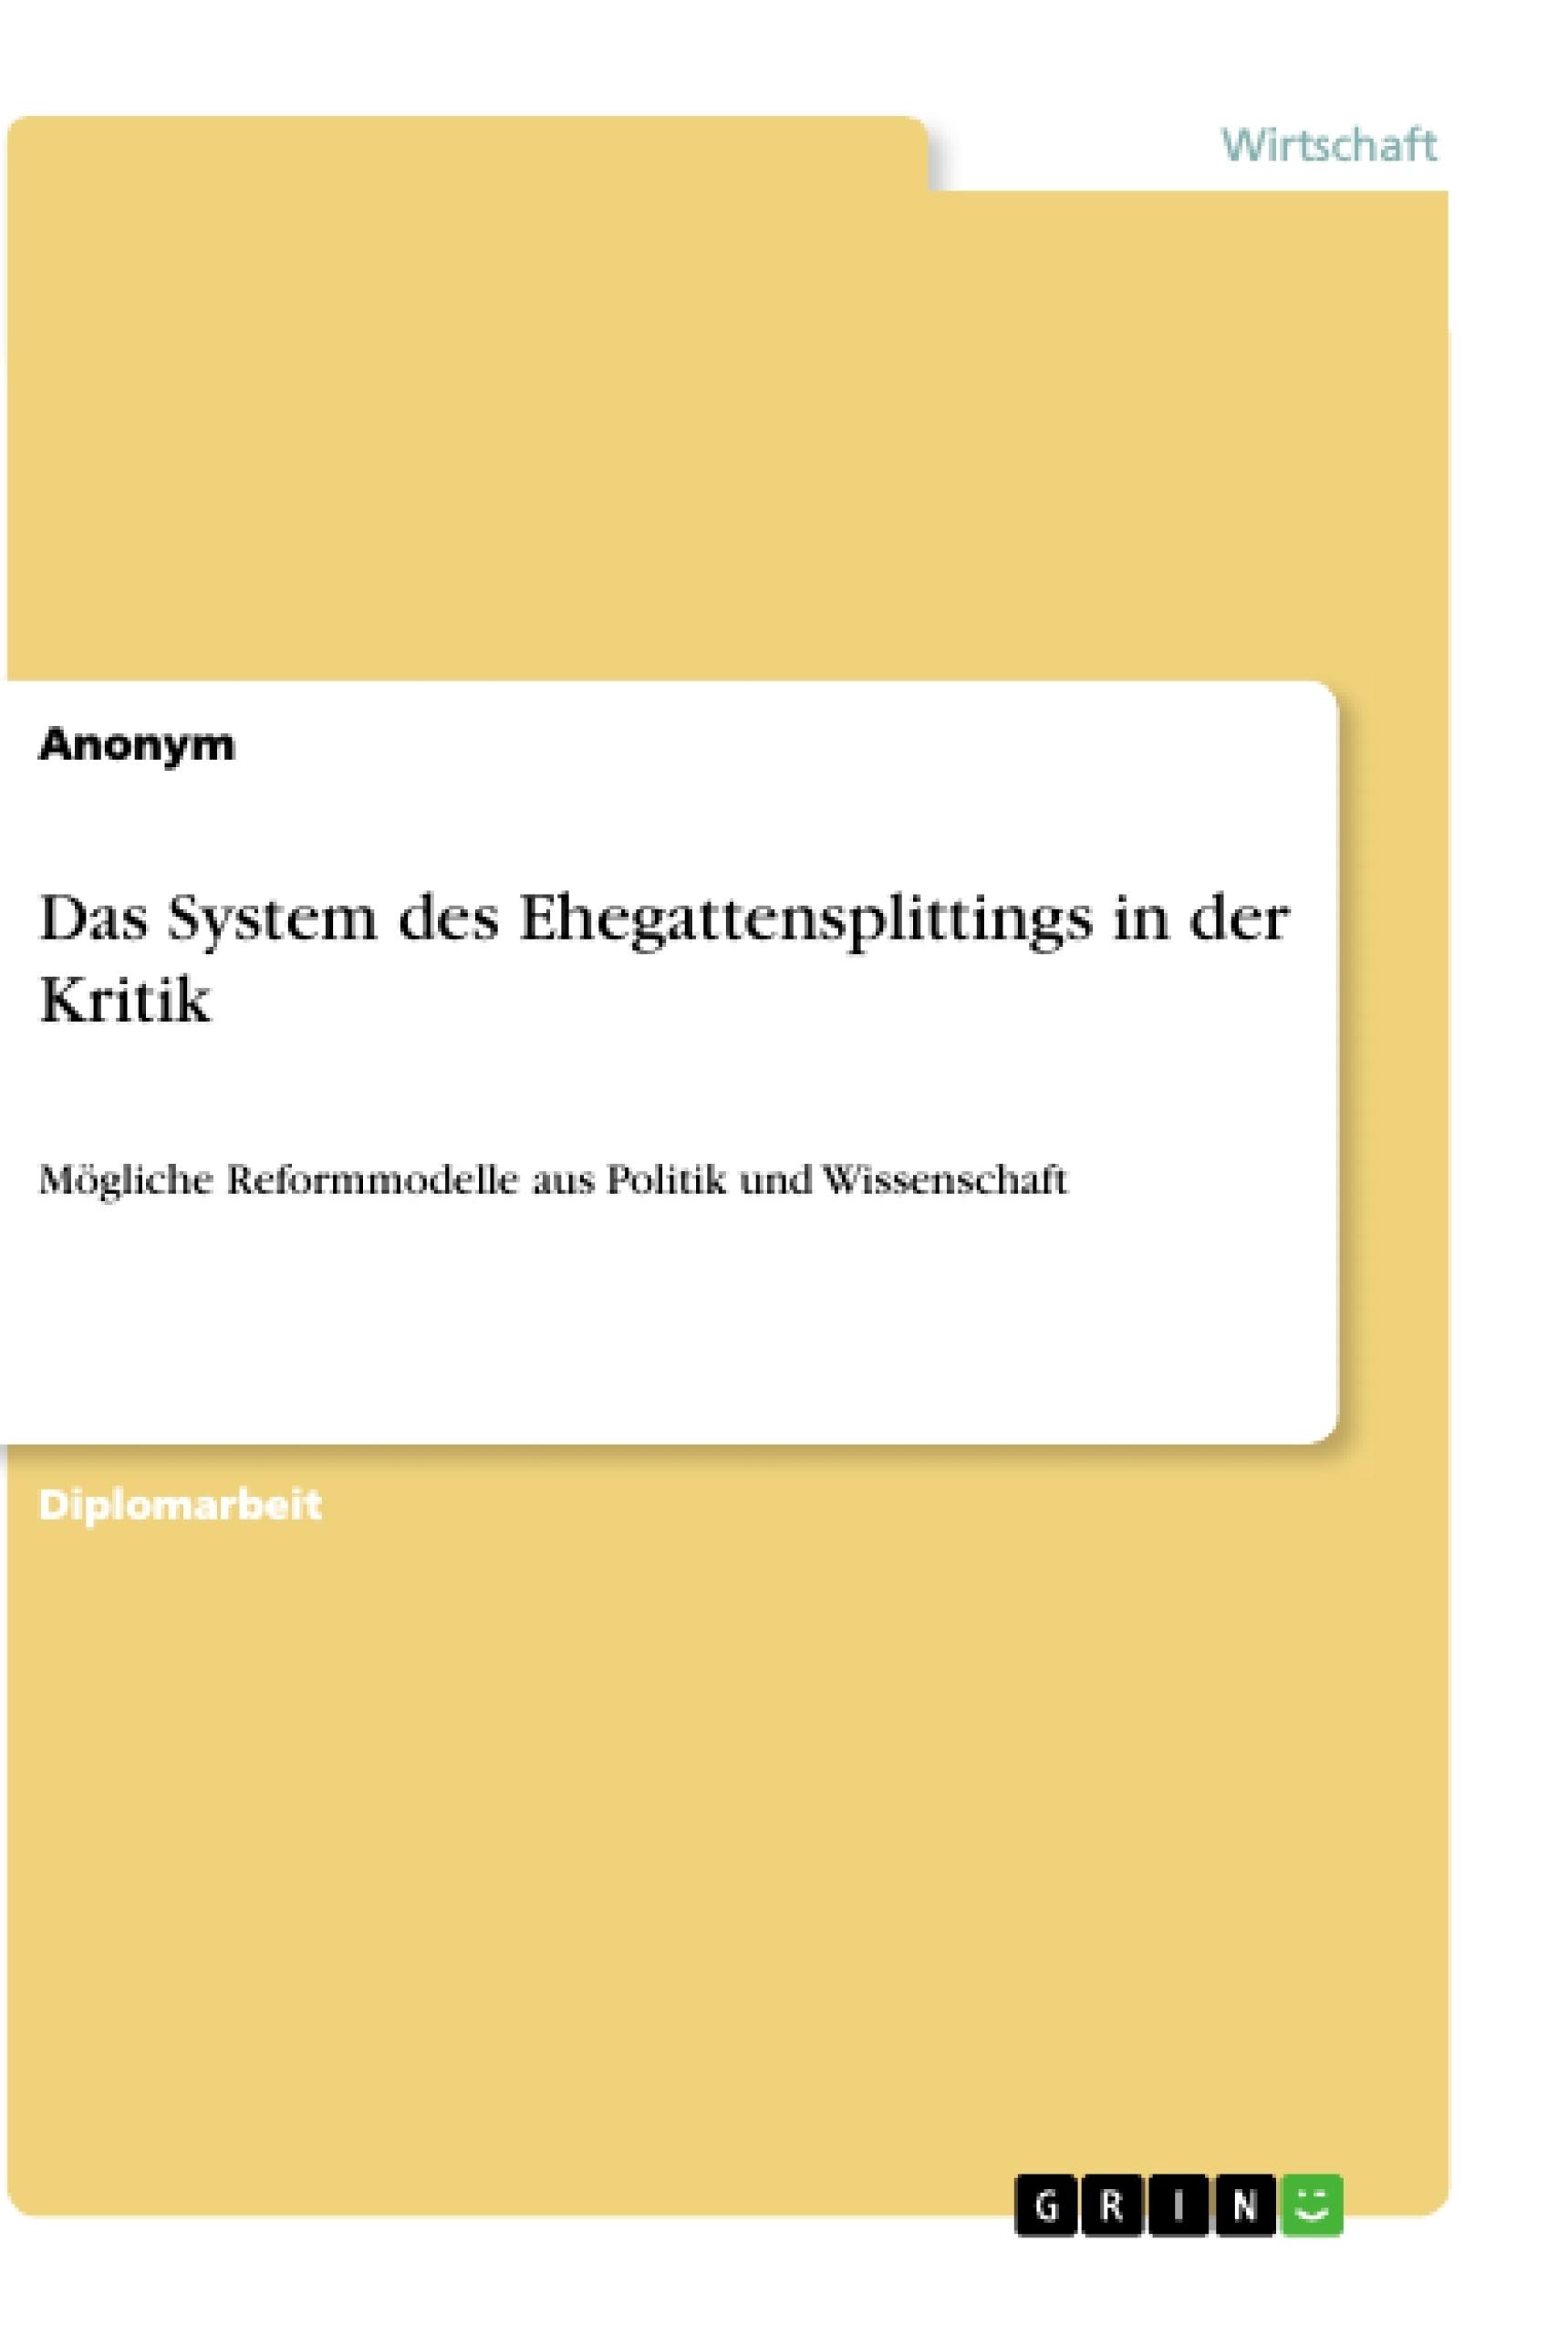 Titel: Das System des Ehegattensplittings in der Kritik